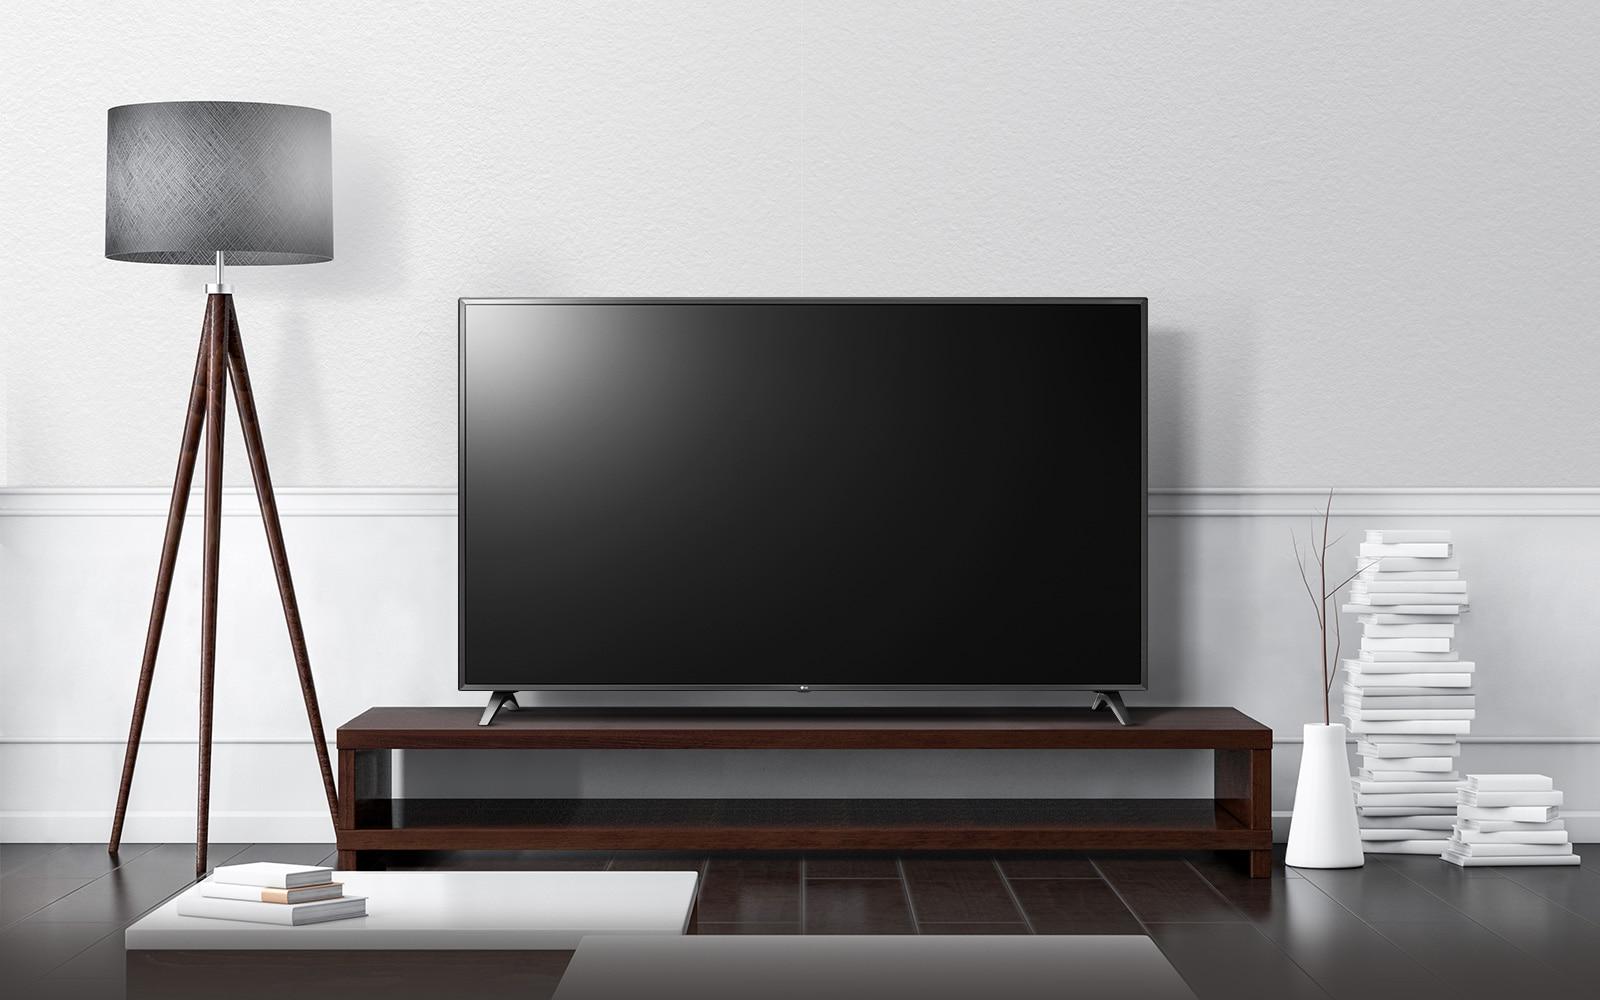 TV-UHD-70-50-UM73-07-Design-Desktop